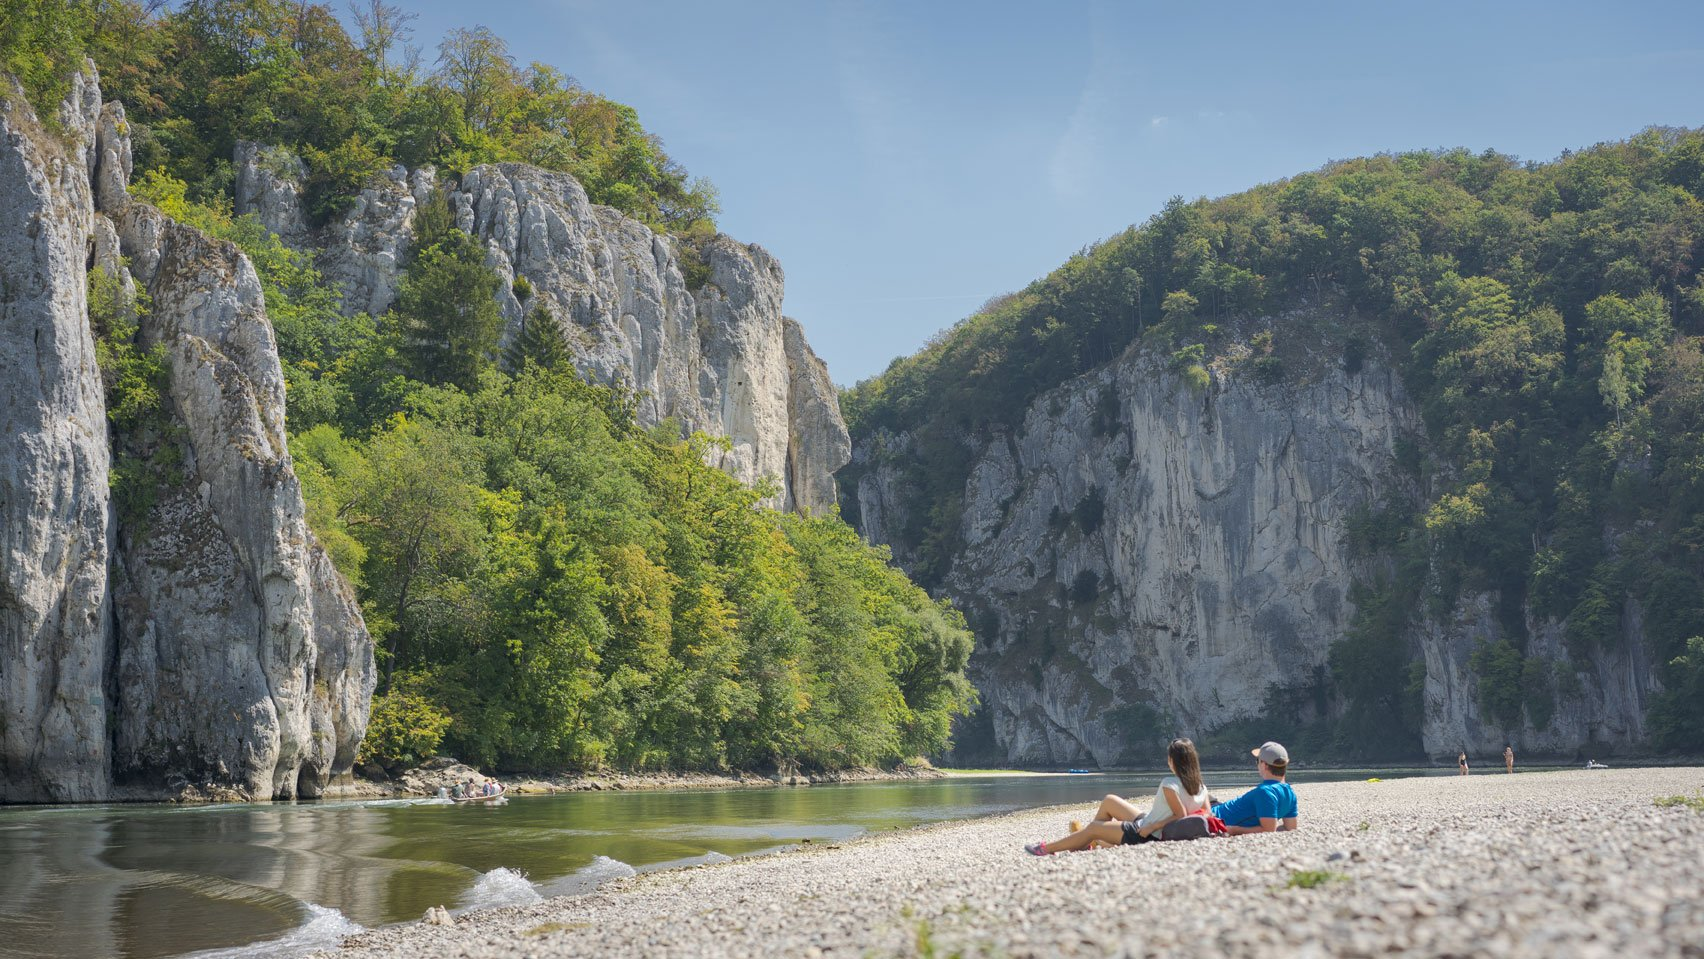 Kiesstrand am Donaudurchbruch